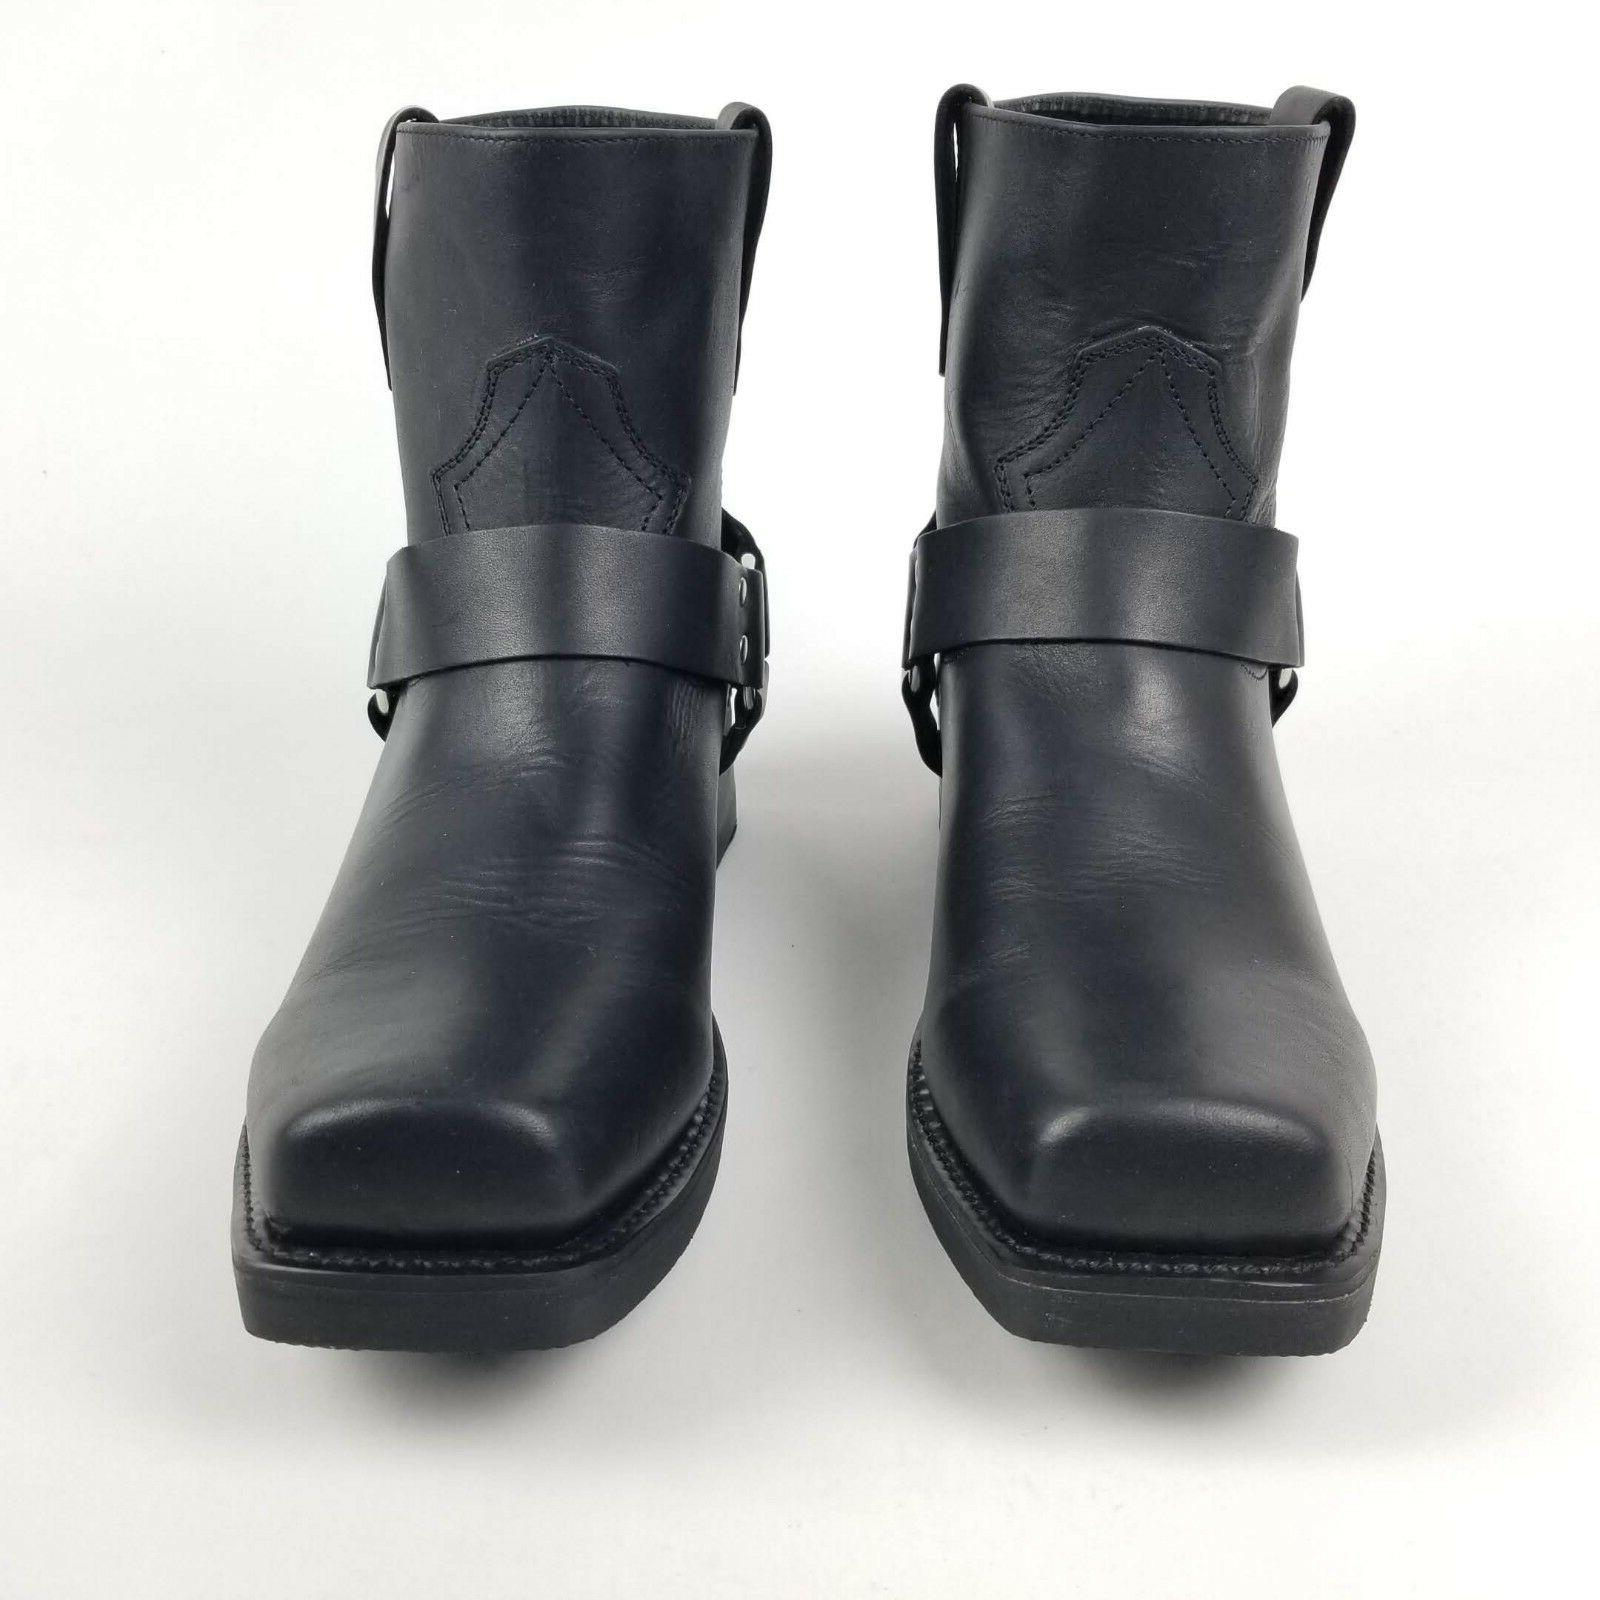 Durango Mens Boots Black Harness Short Leather 12M